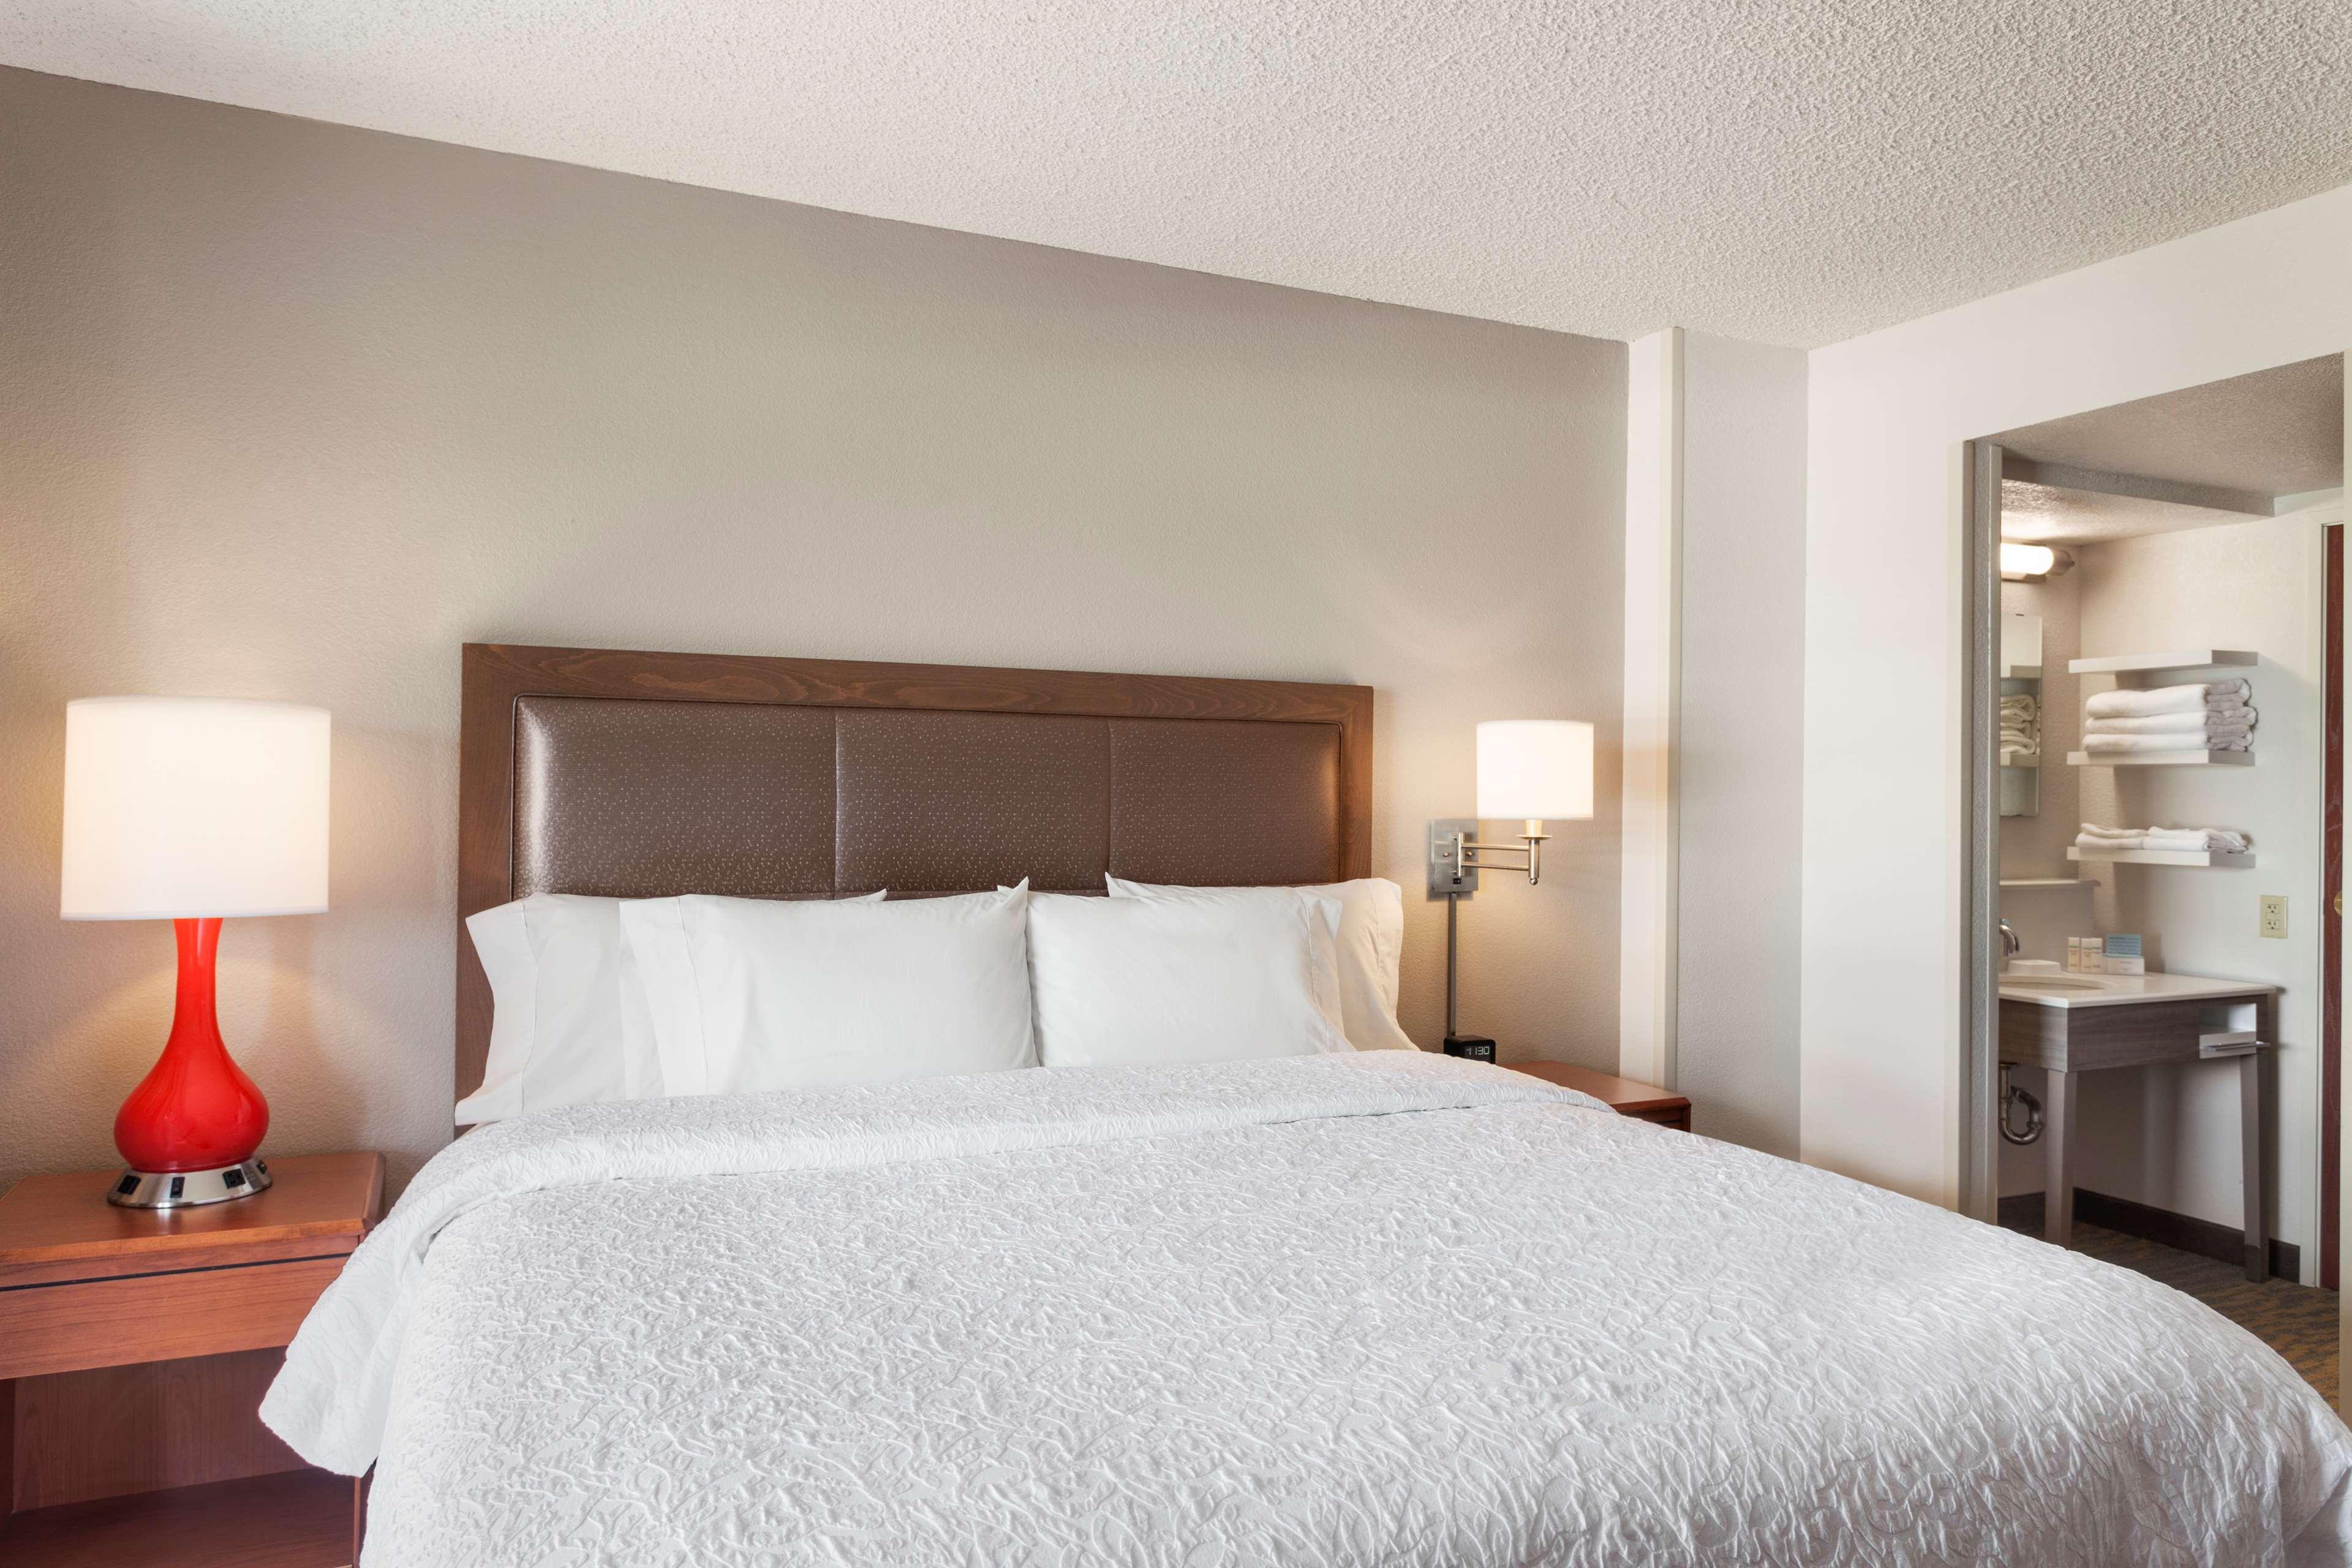 Hampton Inn & Suites Denver-Cherry Creek image 16